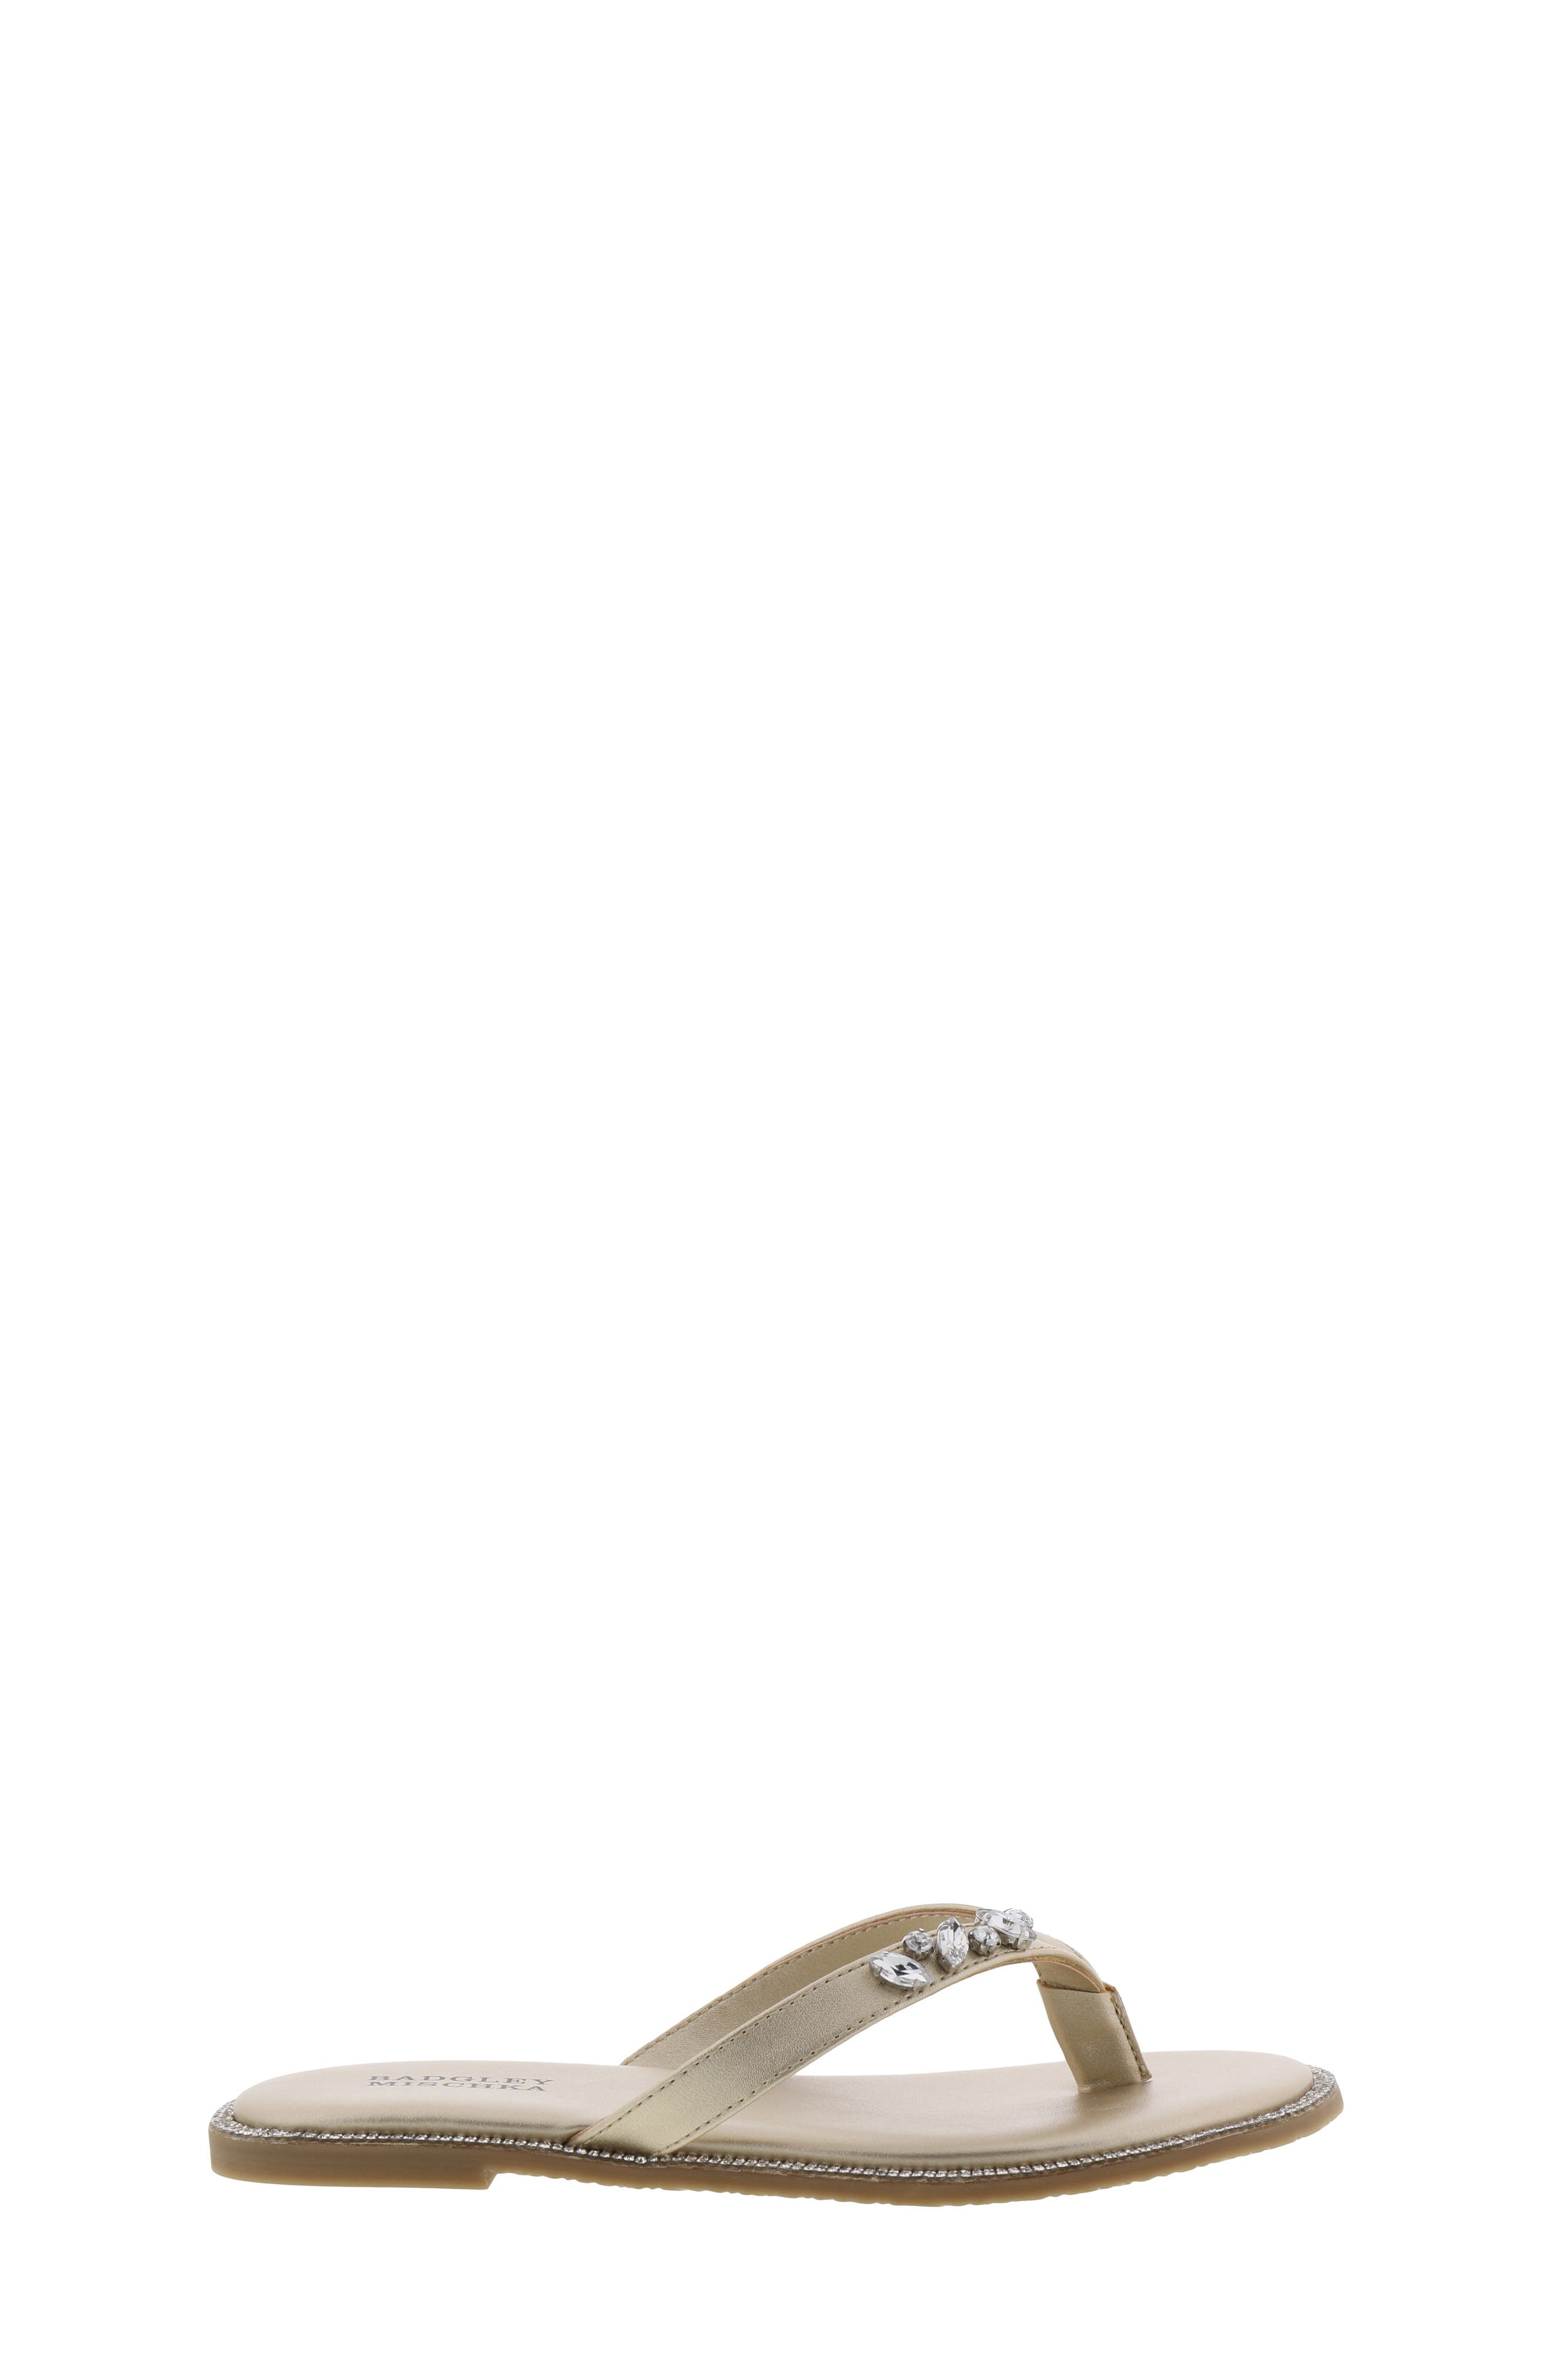 BADGLEY MISCHKA COLLECTION, Badgley Mischka Missy Flip Flop, Alternate thumbnail 3, color, LIGHT GOLD SHIMMER